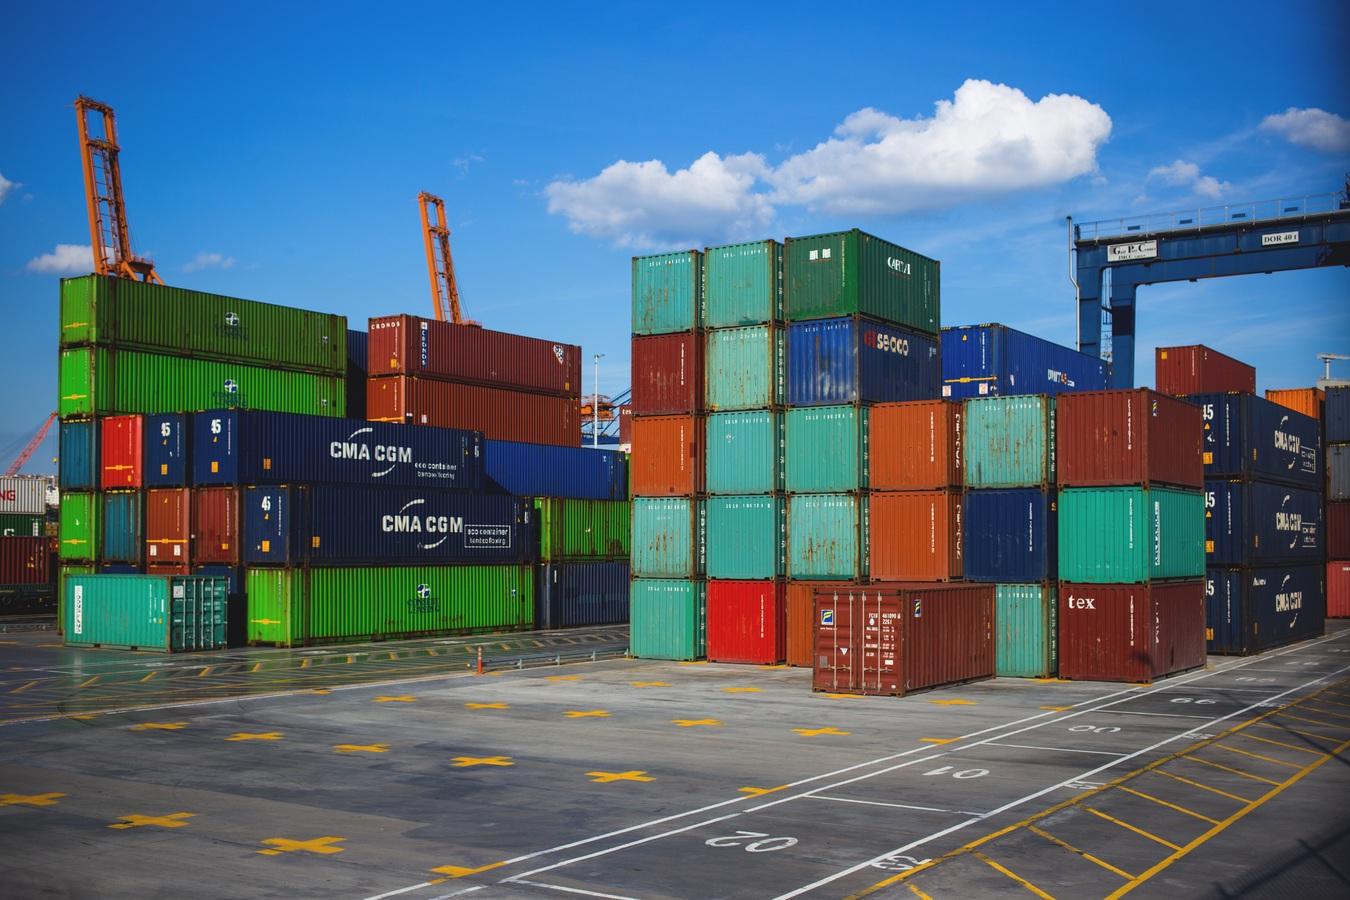 39 dead migrants in truck container